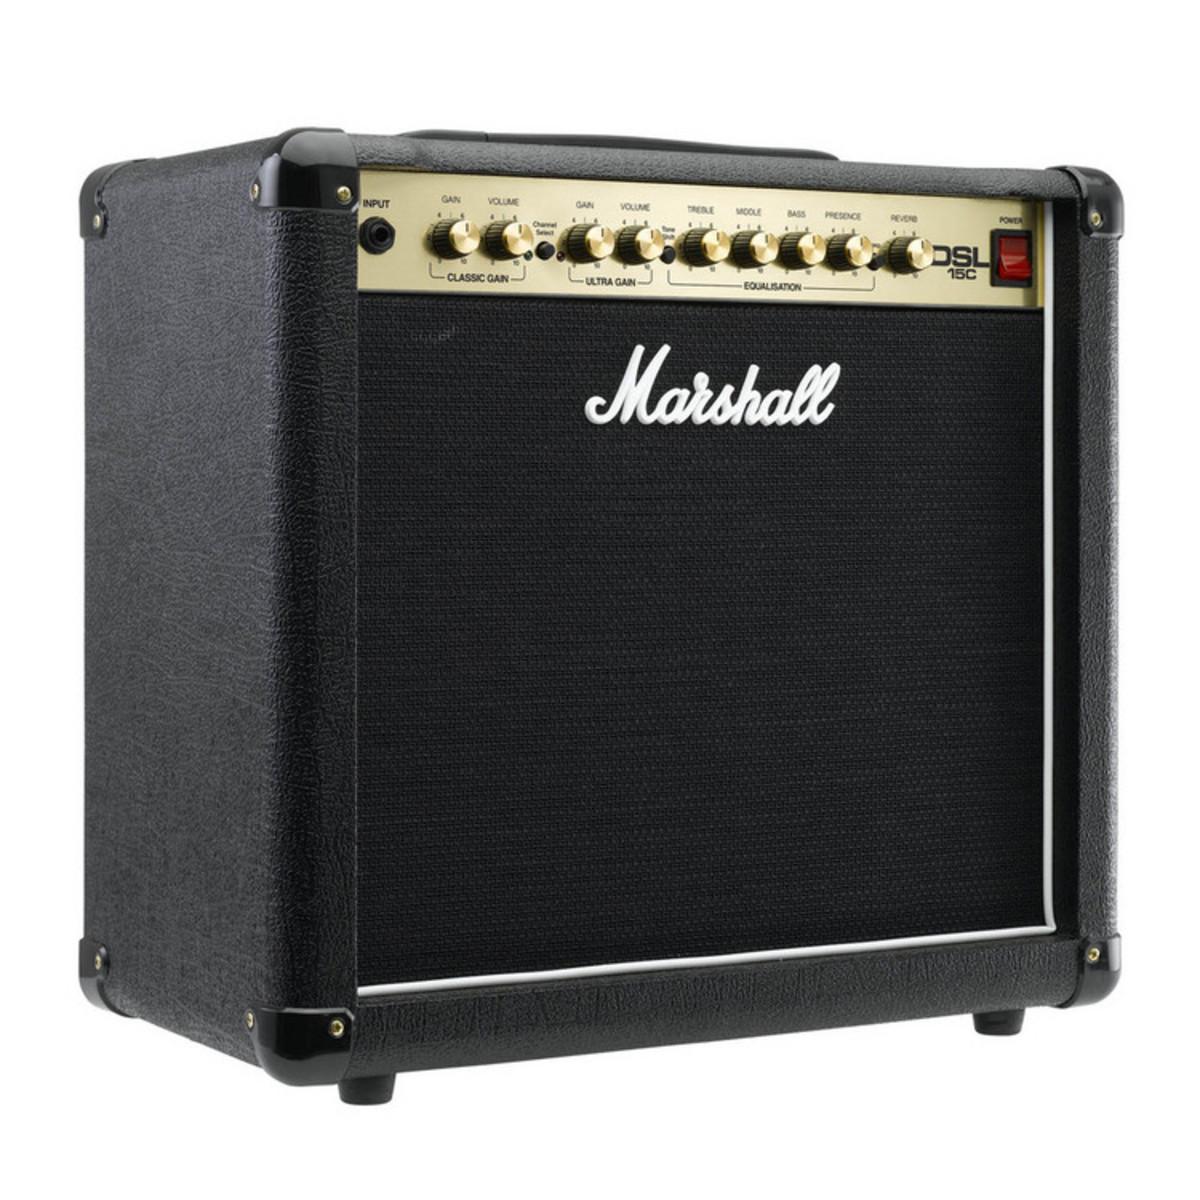 marshall dsl15c dsl series 15w guitar combo amp at. Black Bedroom Furniture Sets. Home Design Ideas